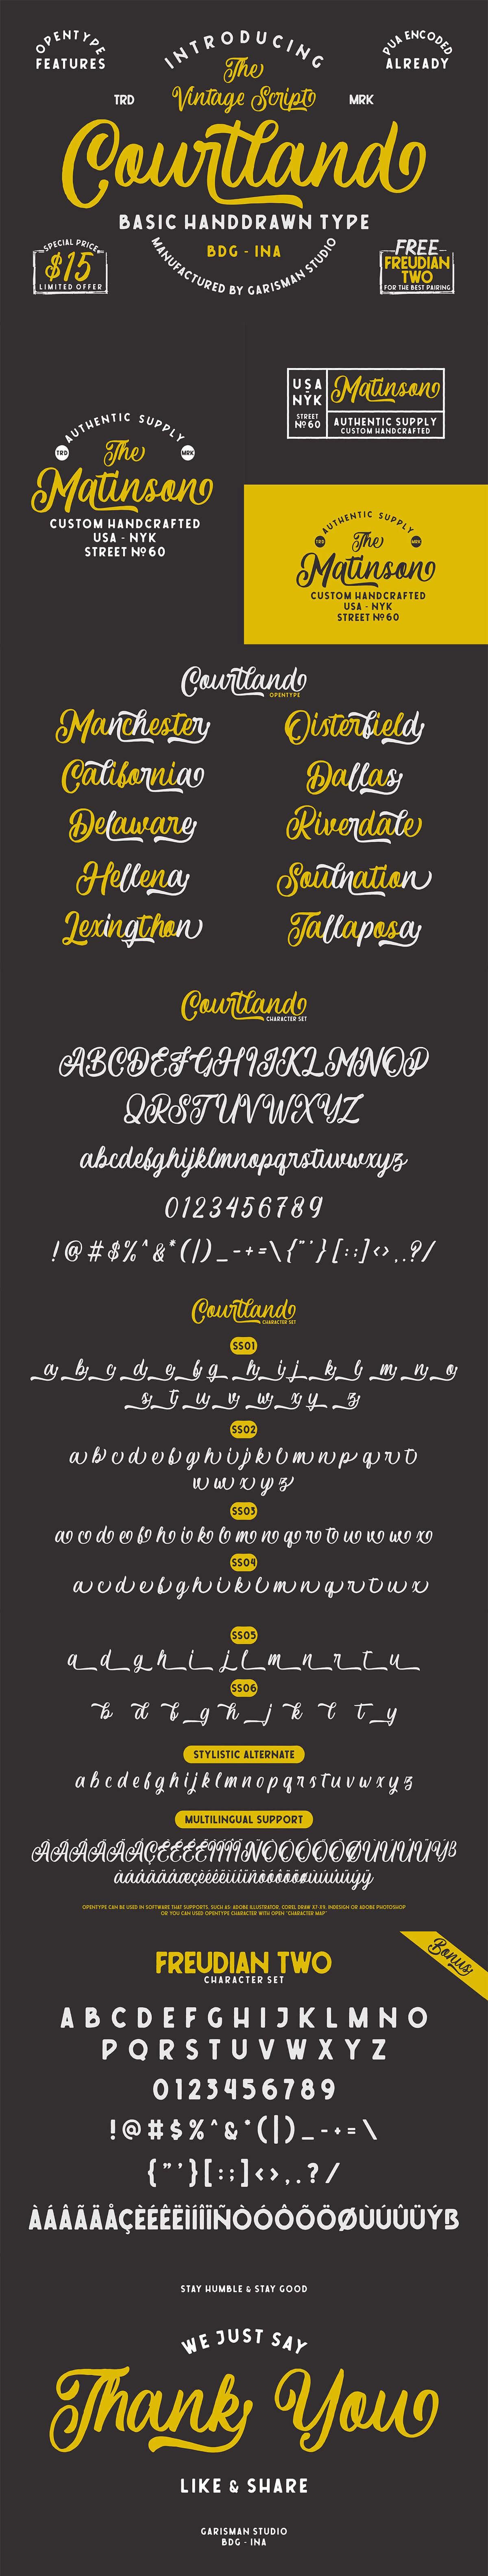 Free Courtland Vintage Script Font